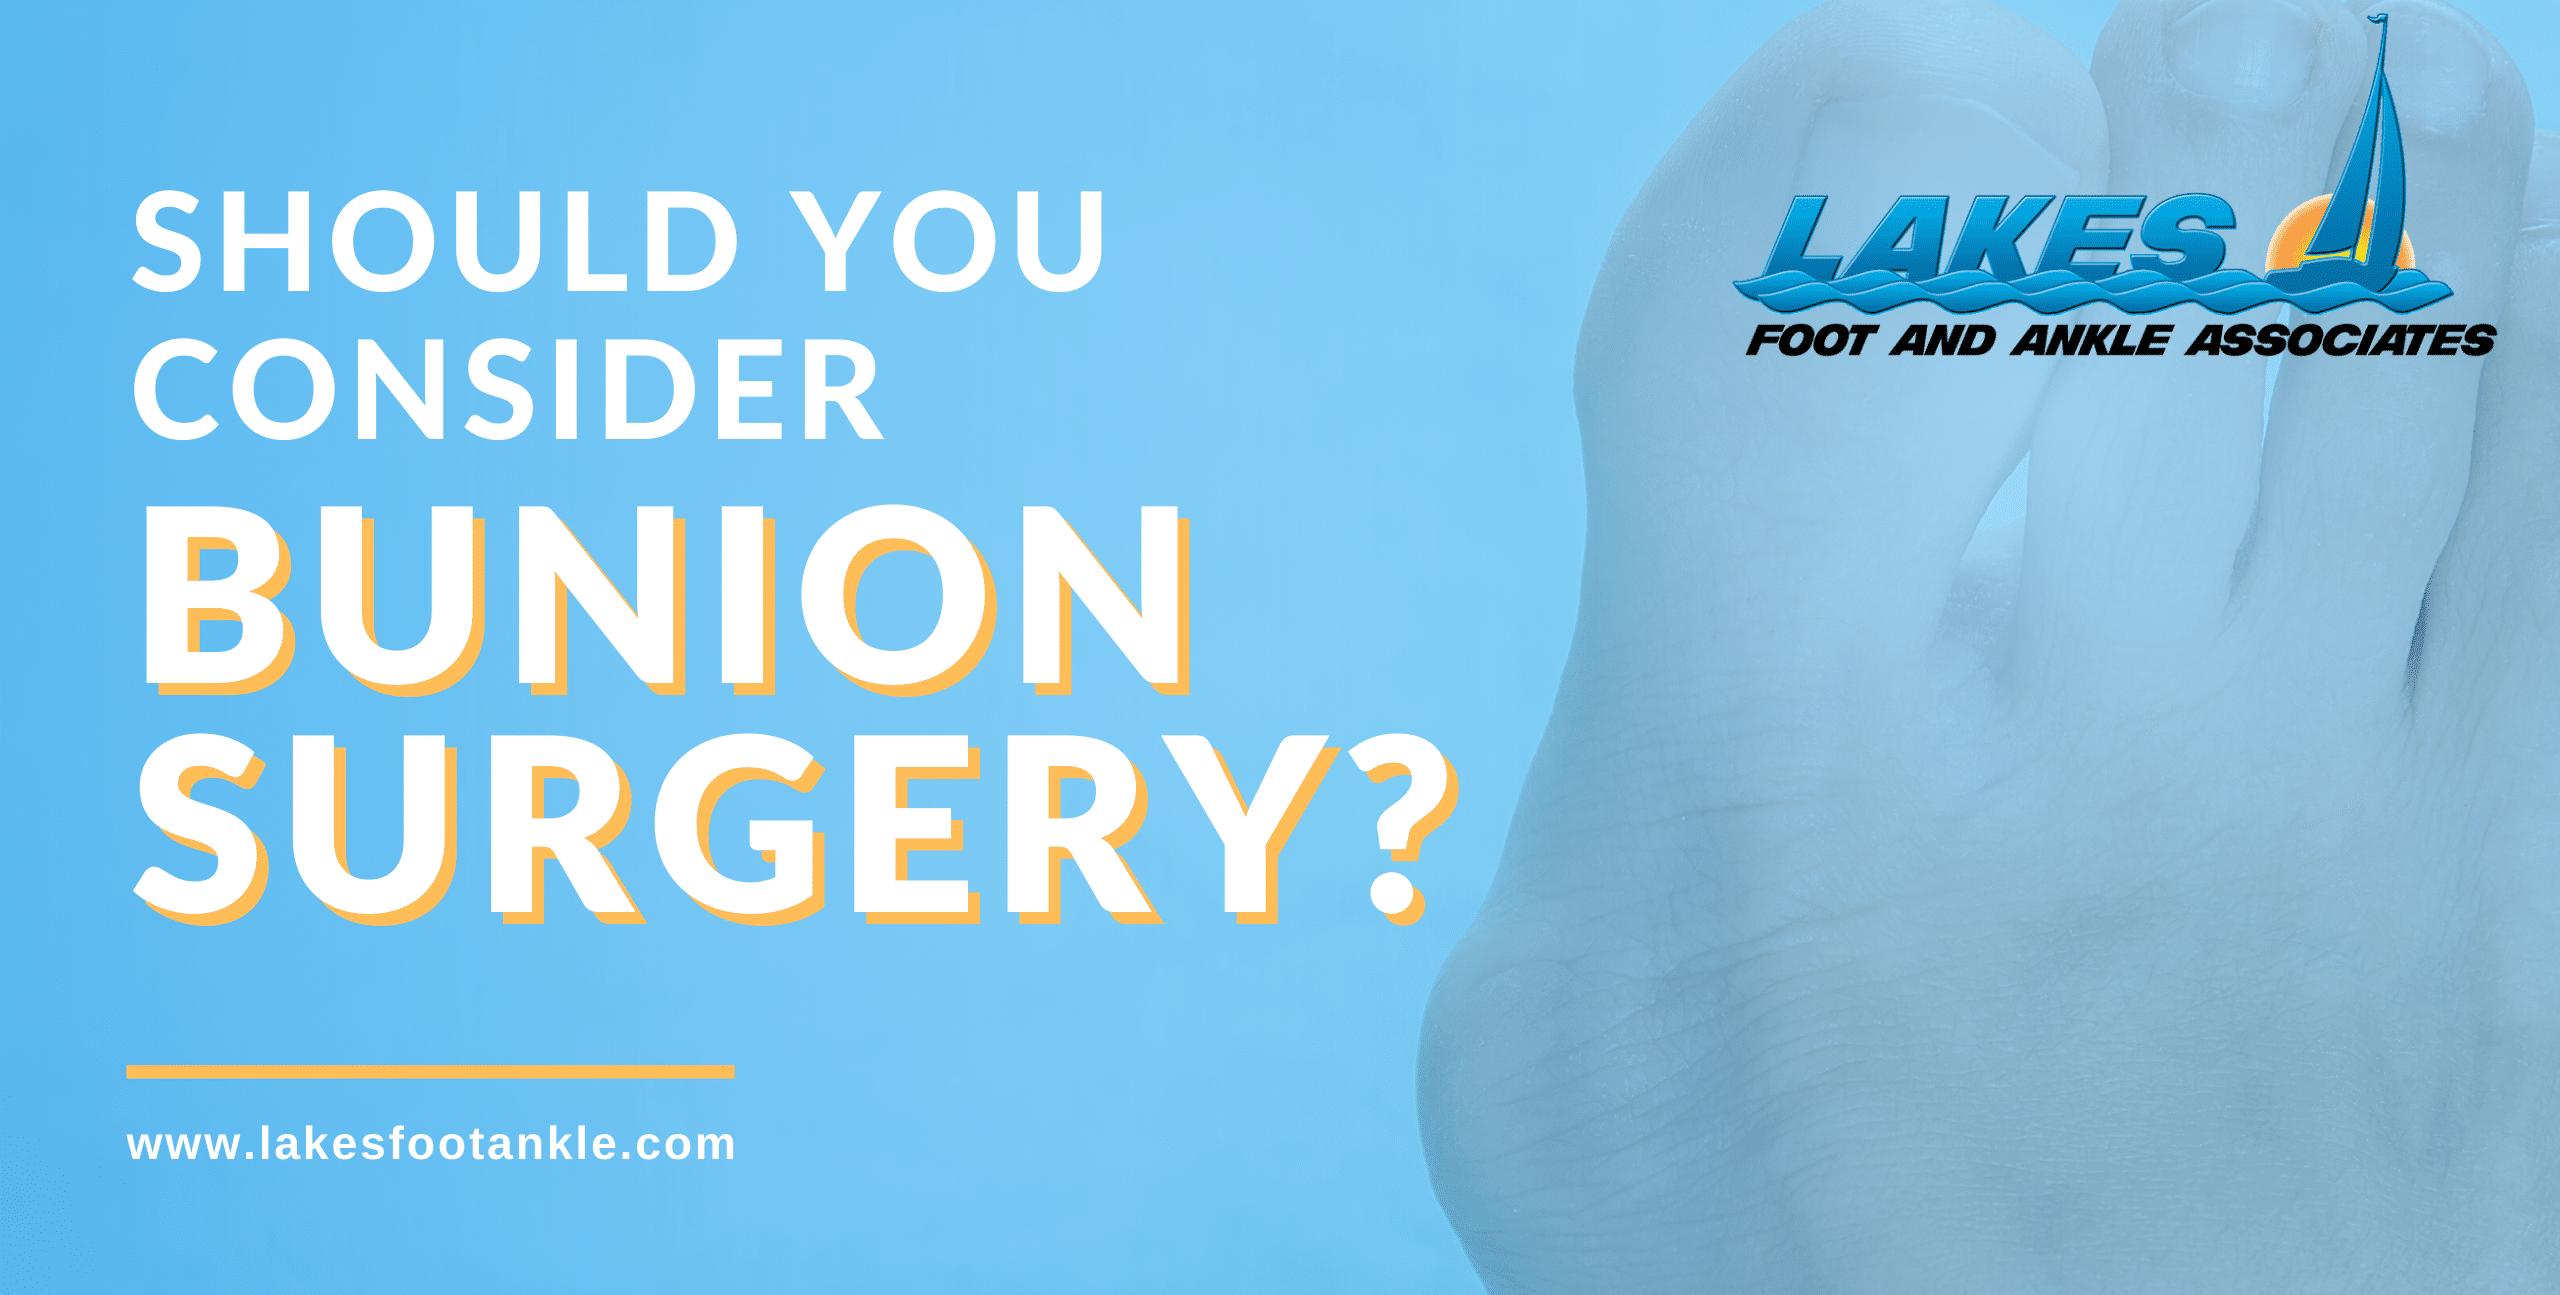 Should You Consider Bunion Surgery?